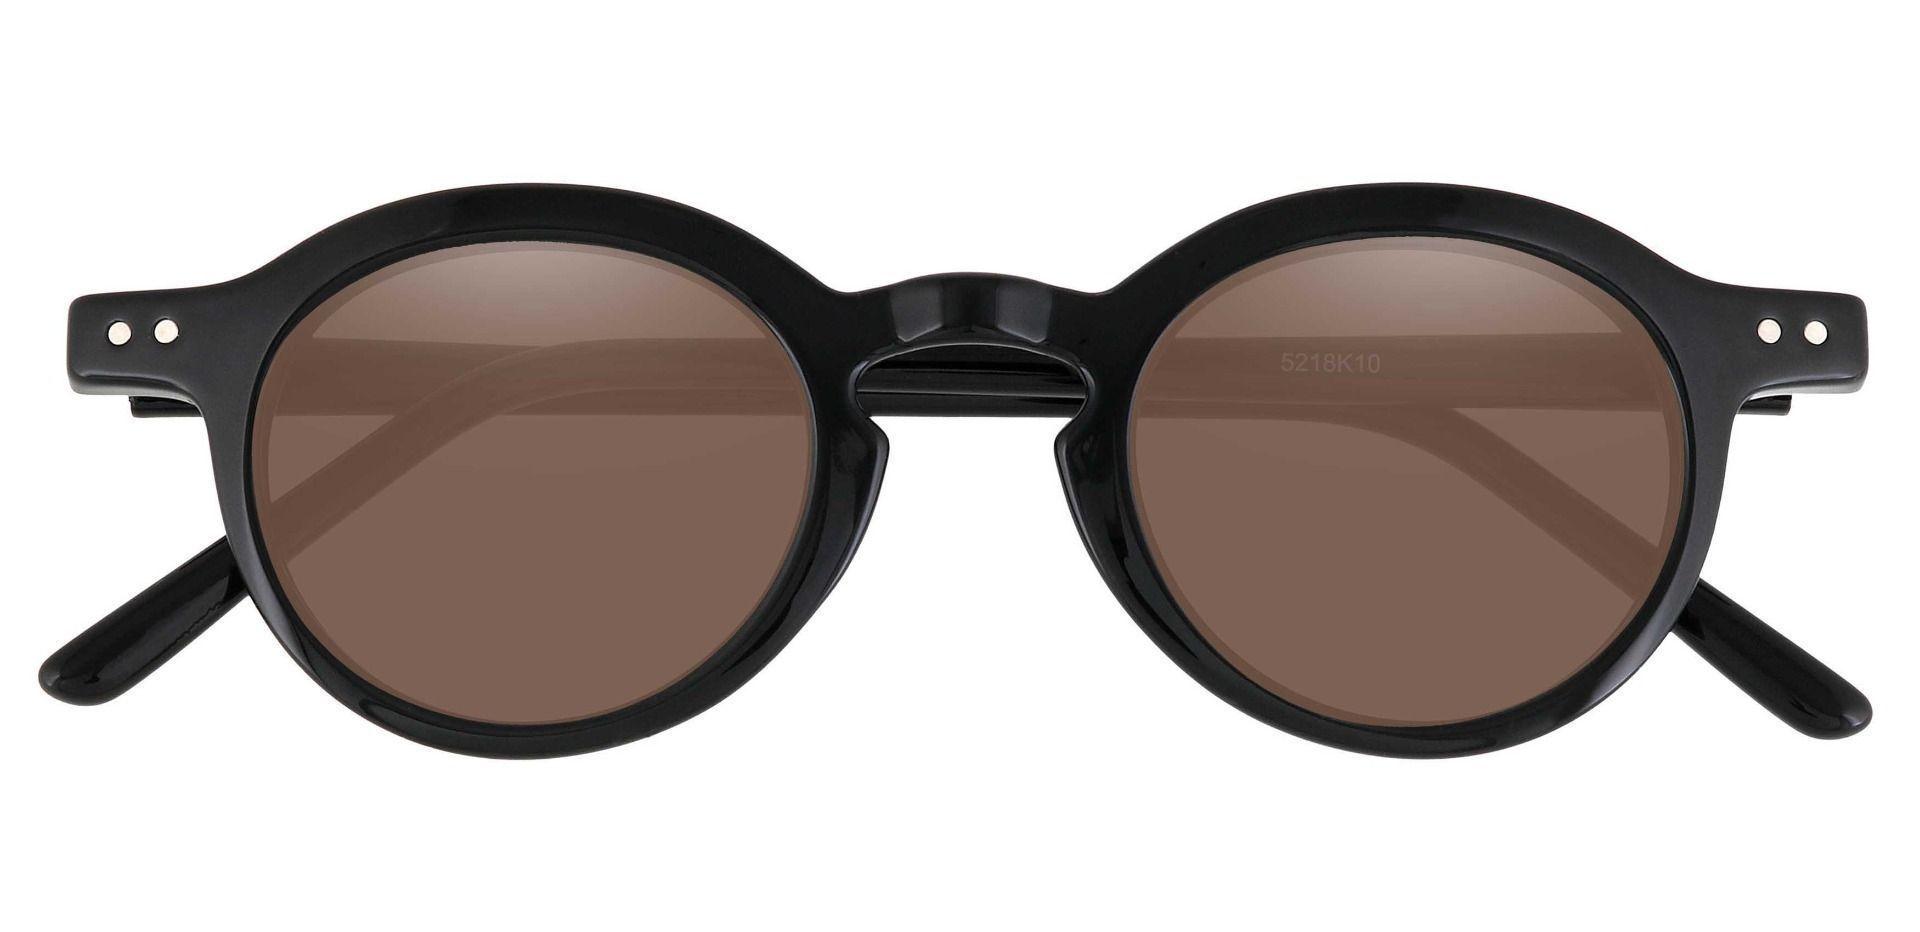 Moonshine Round Prescription Sunglasses - Black Frame With Brown Lenses